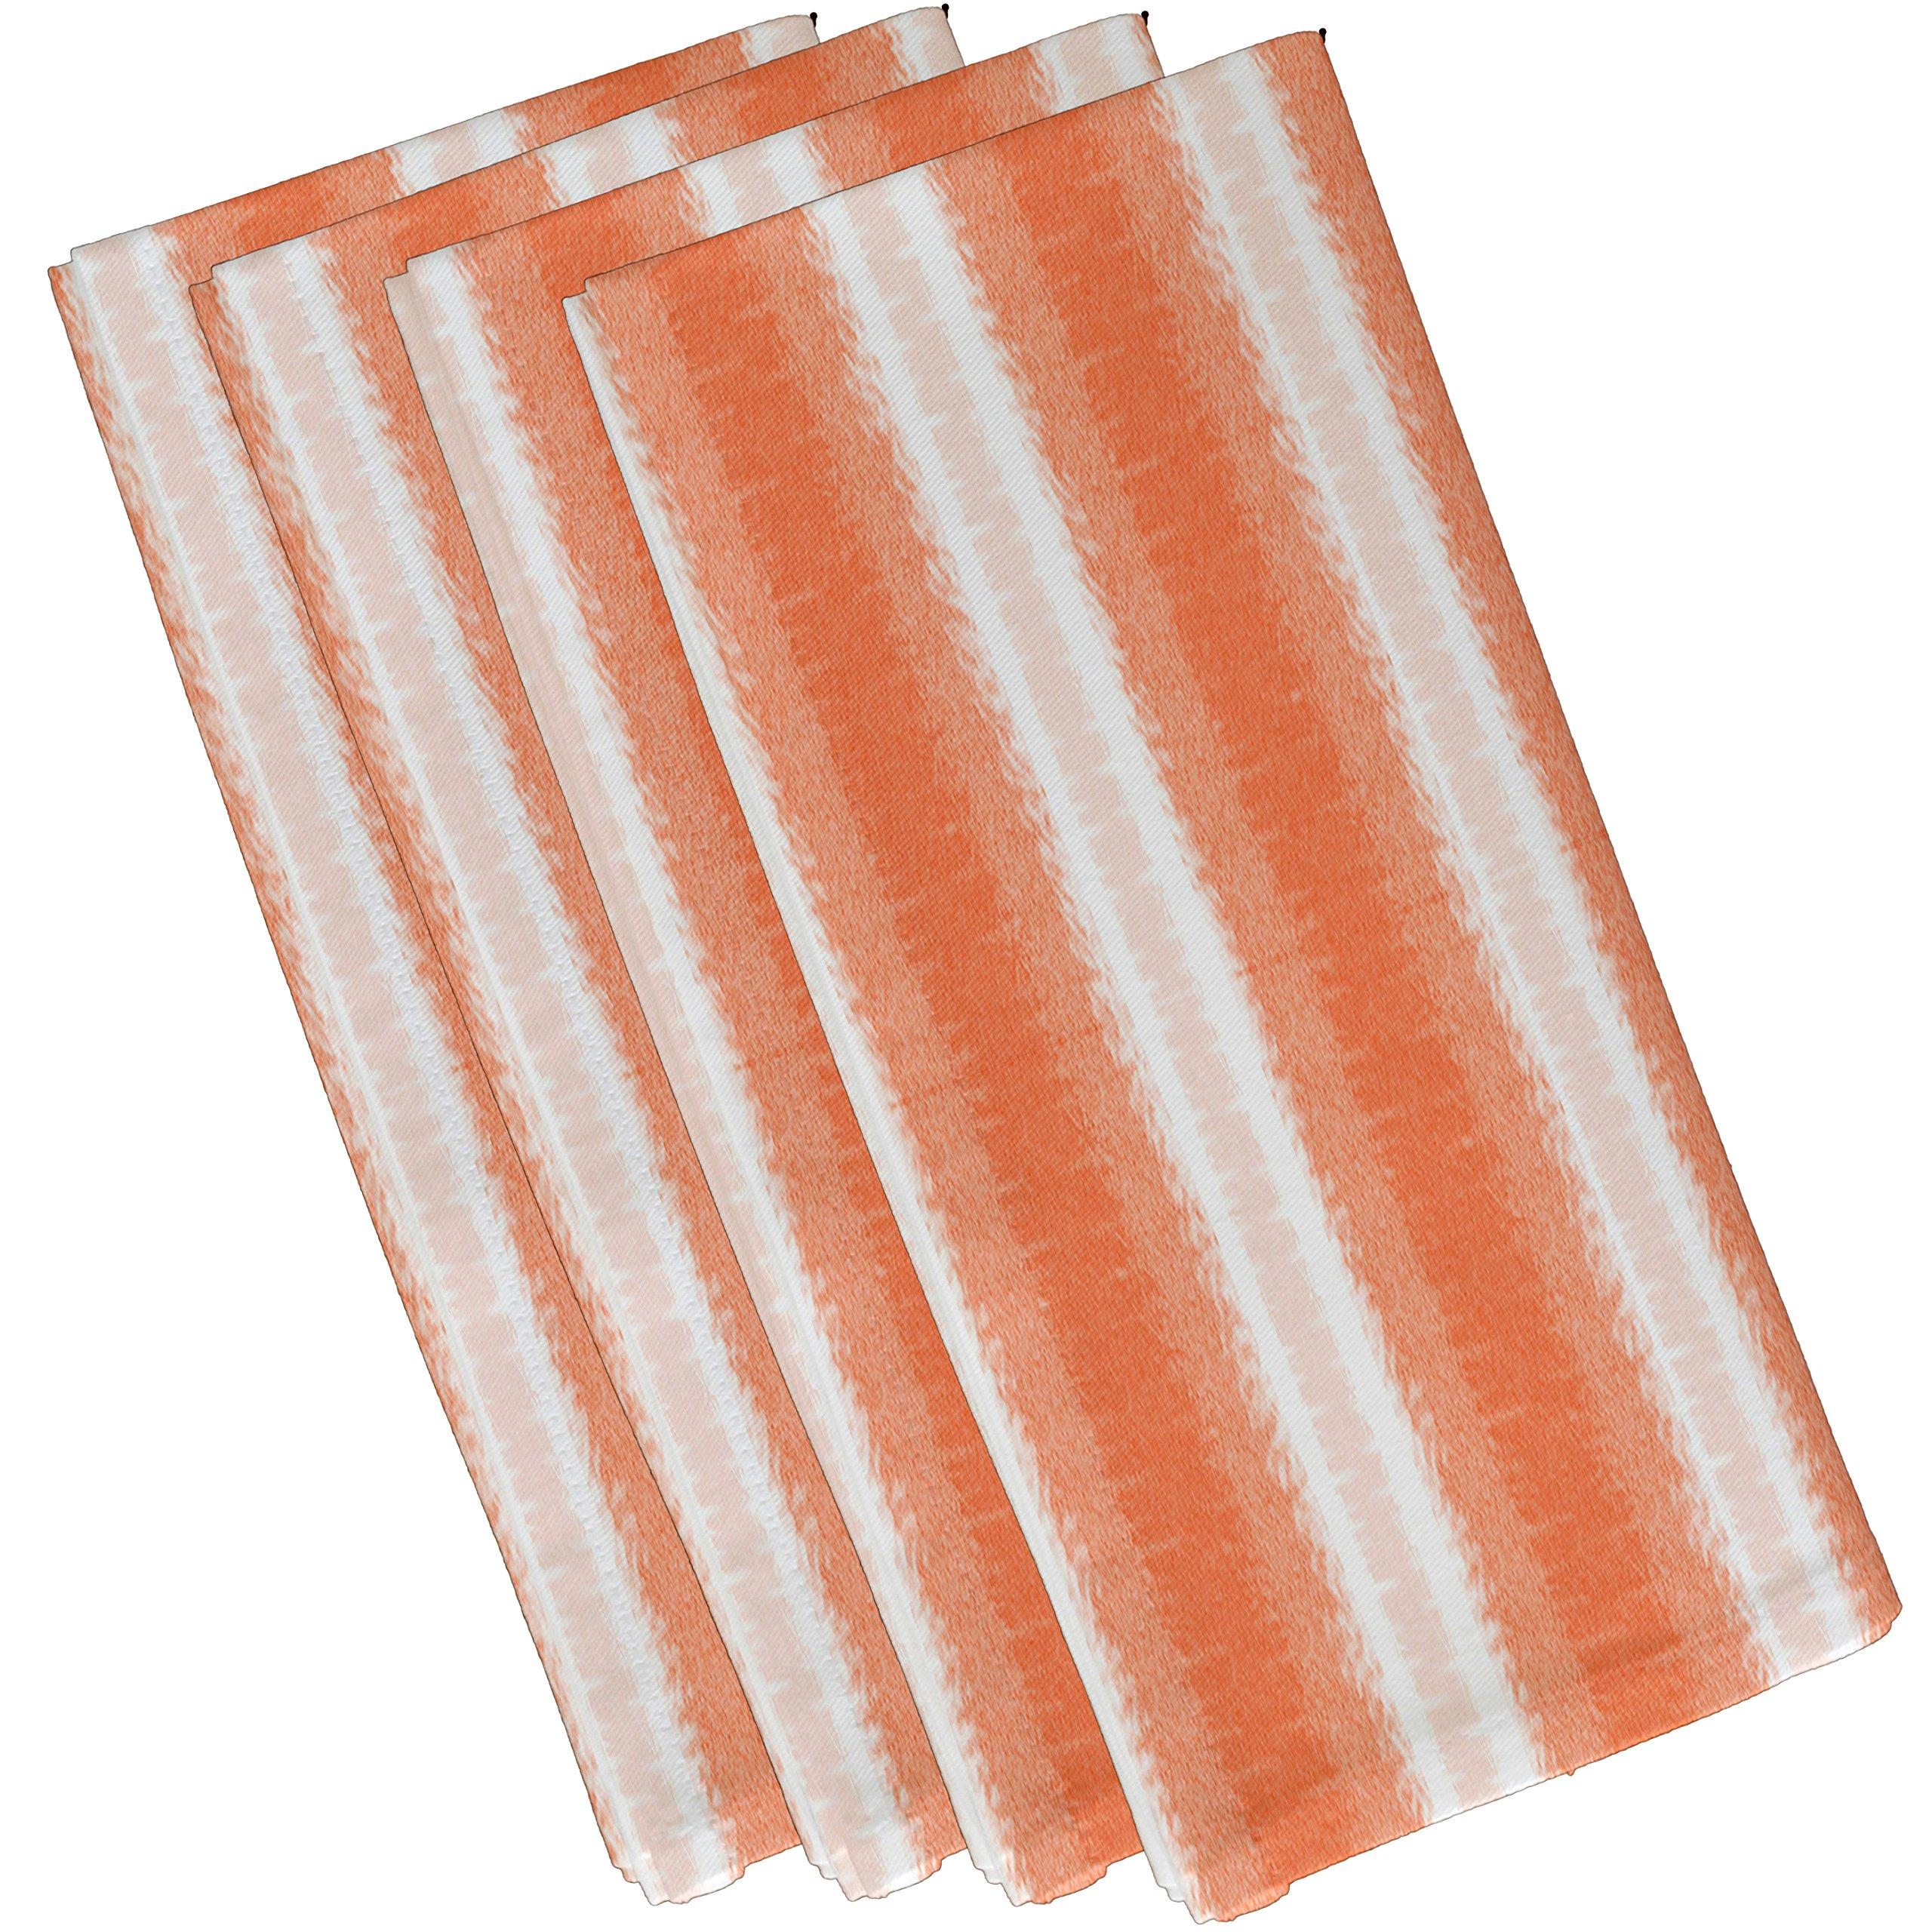 E by design N4S776O1 Sea Lines Stripe Print Napkin (Set of 4), 19'' x 19'', Orange by E by design